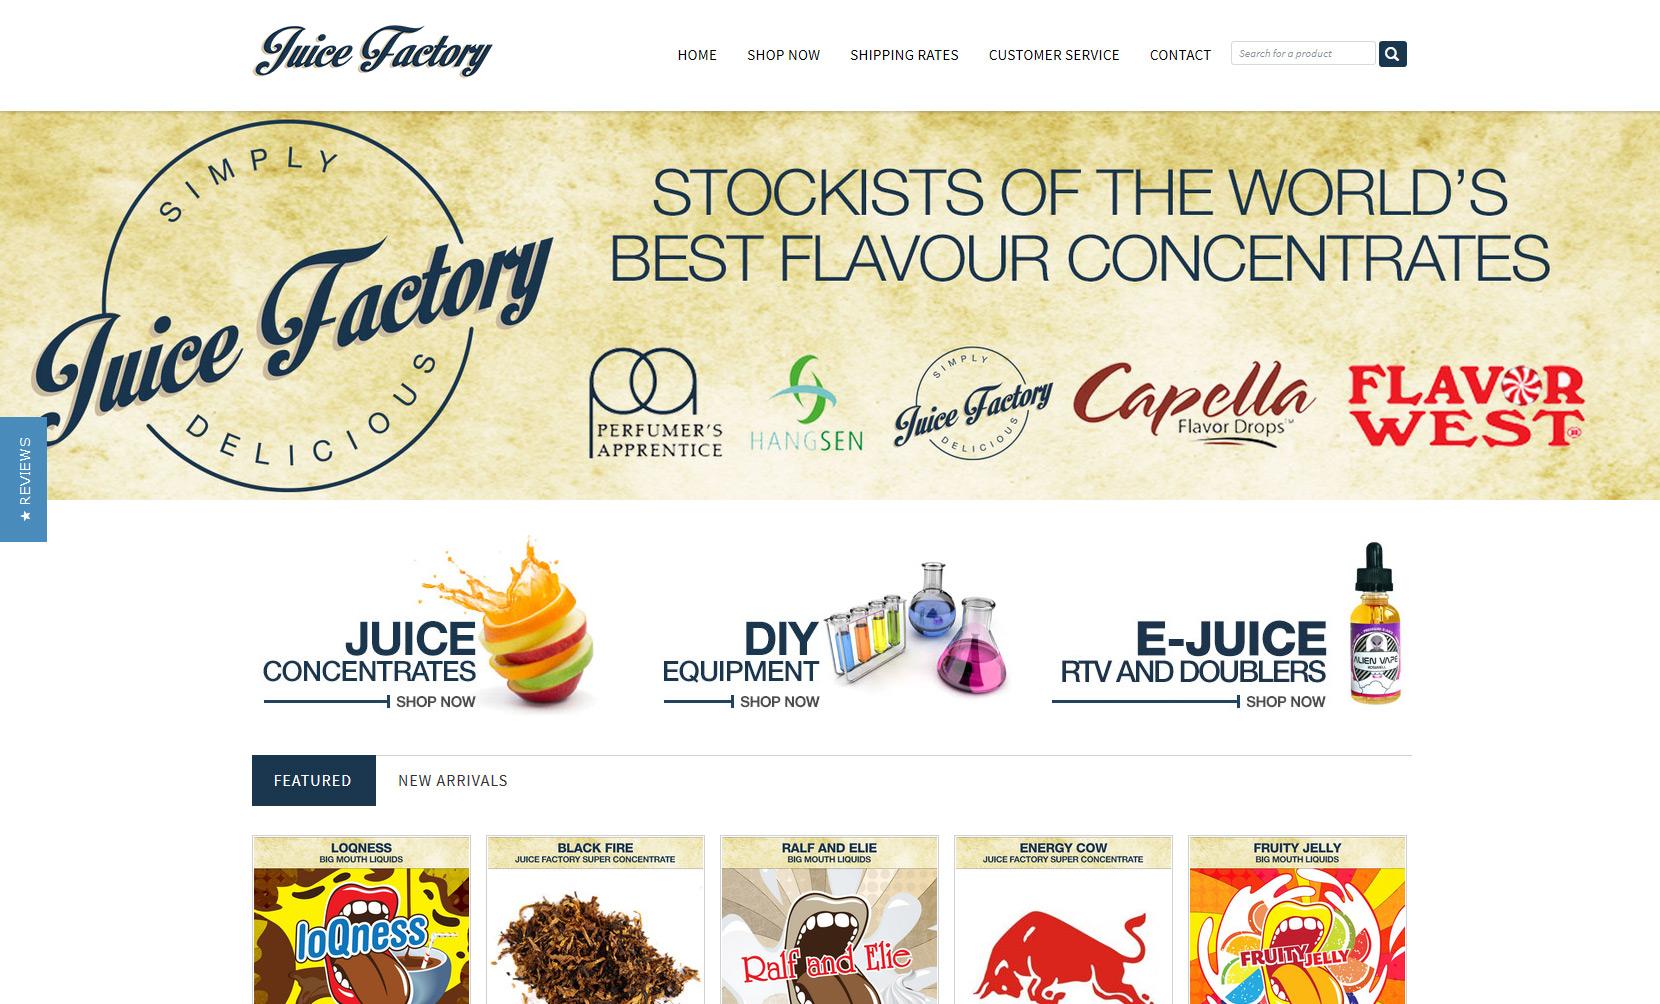 VaporFi Australia - Best Places to Buy E-Liquid: Juice Factory